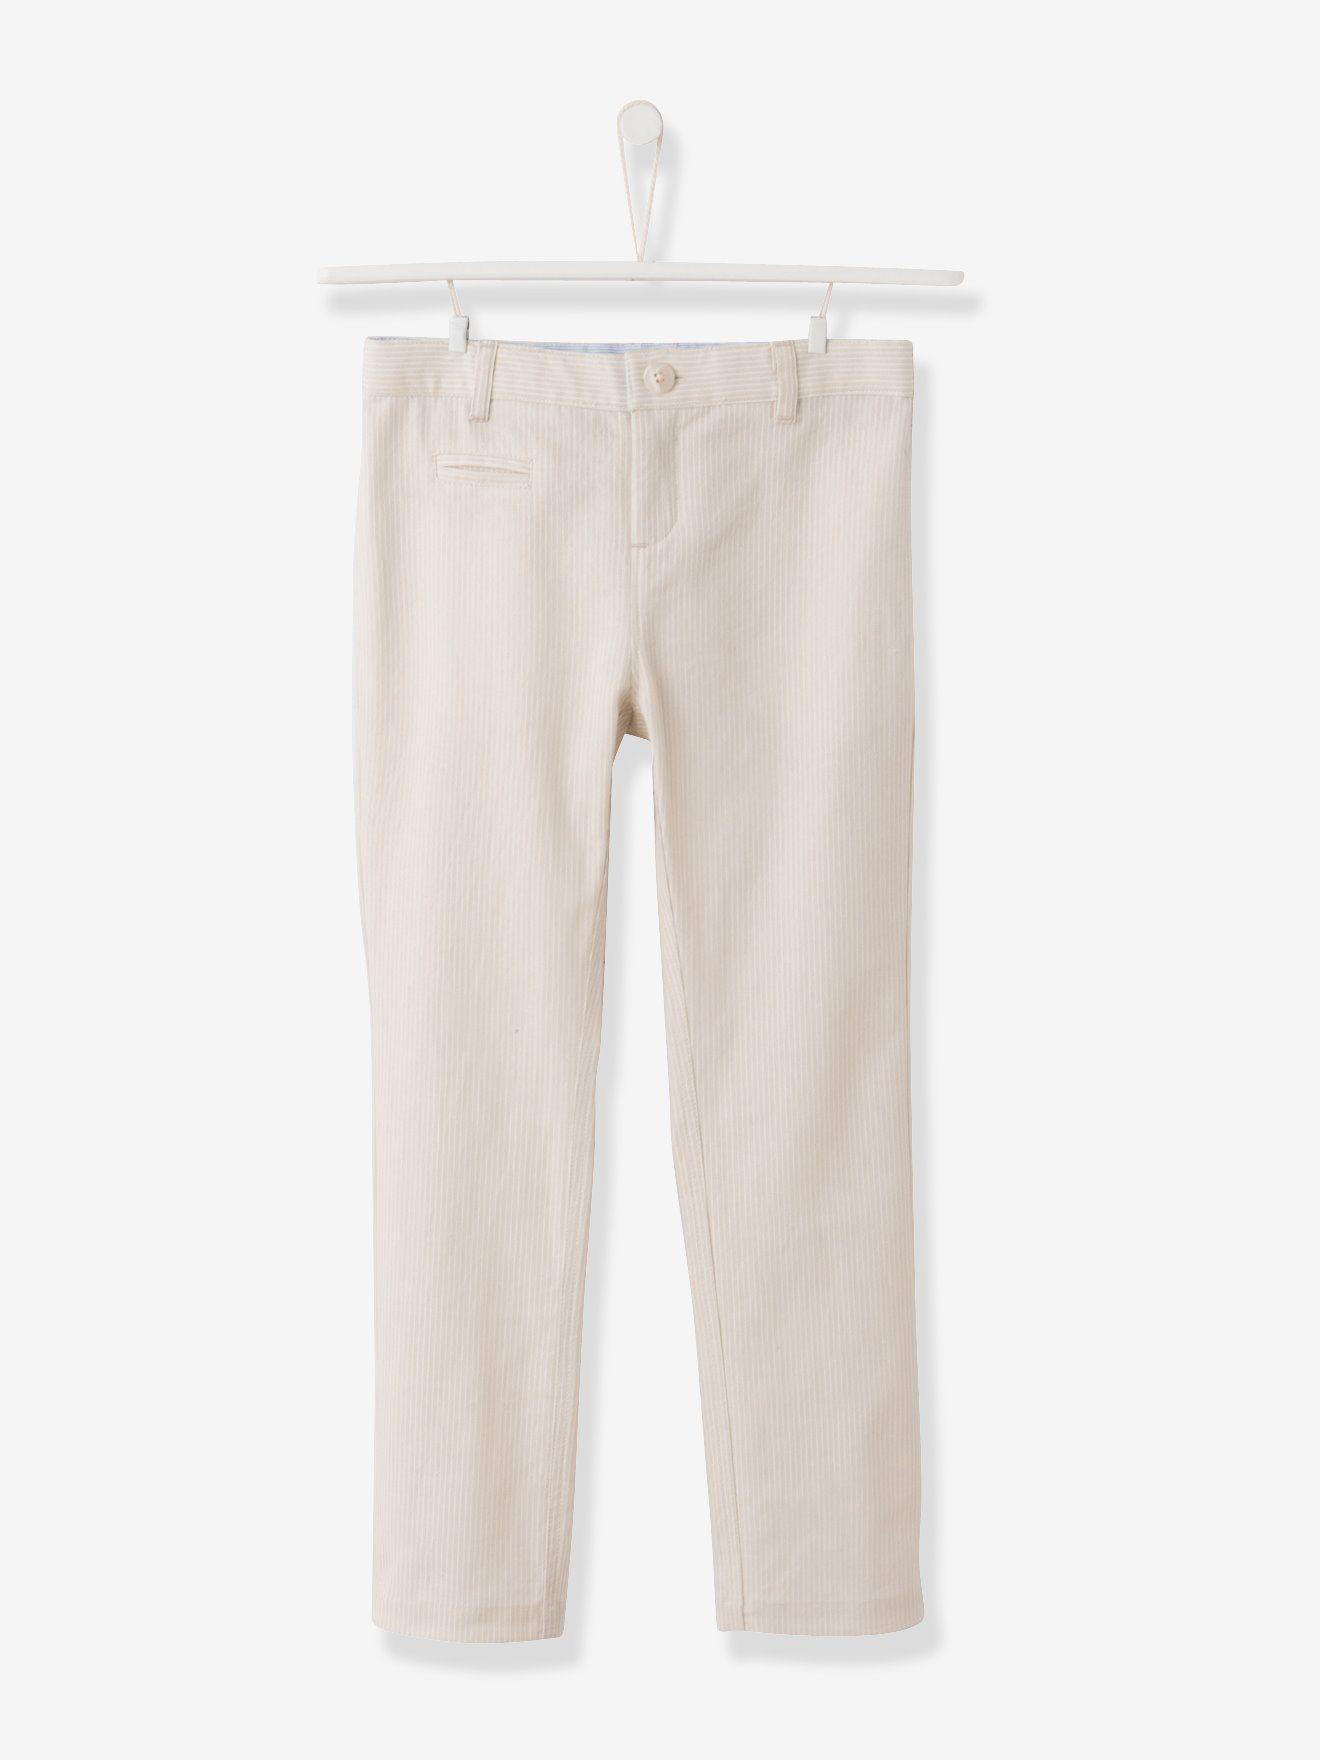 Vertbaudet Pantalon Chino gar/çon